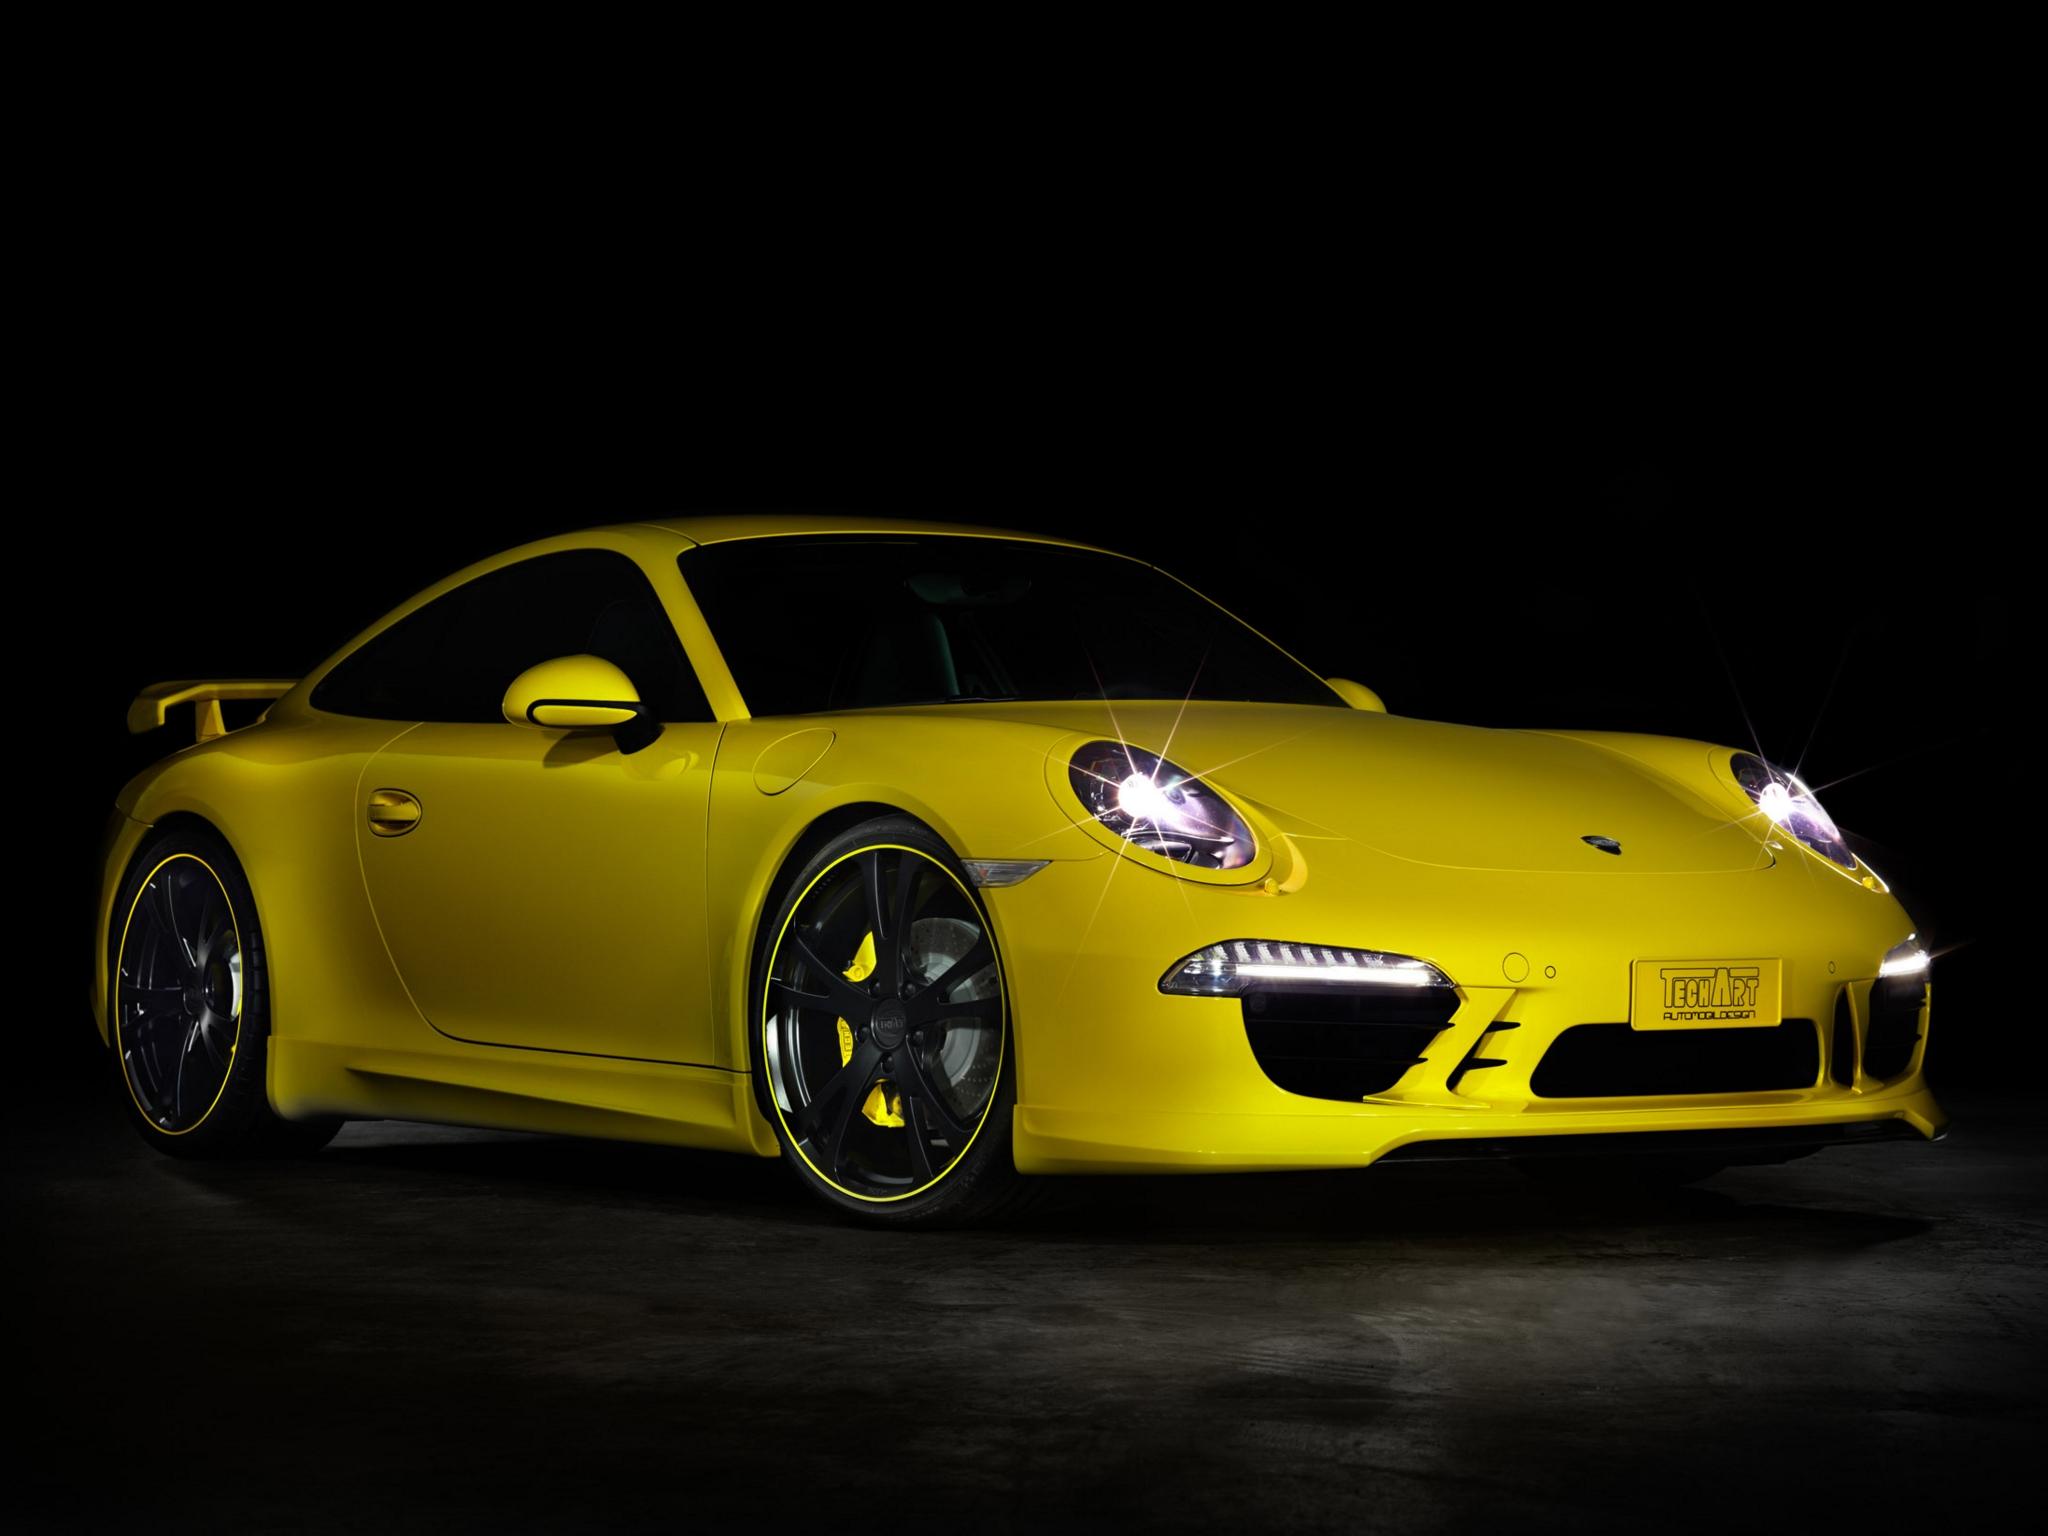 Porsche 911 Carrera Wallpapers Pictures Images